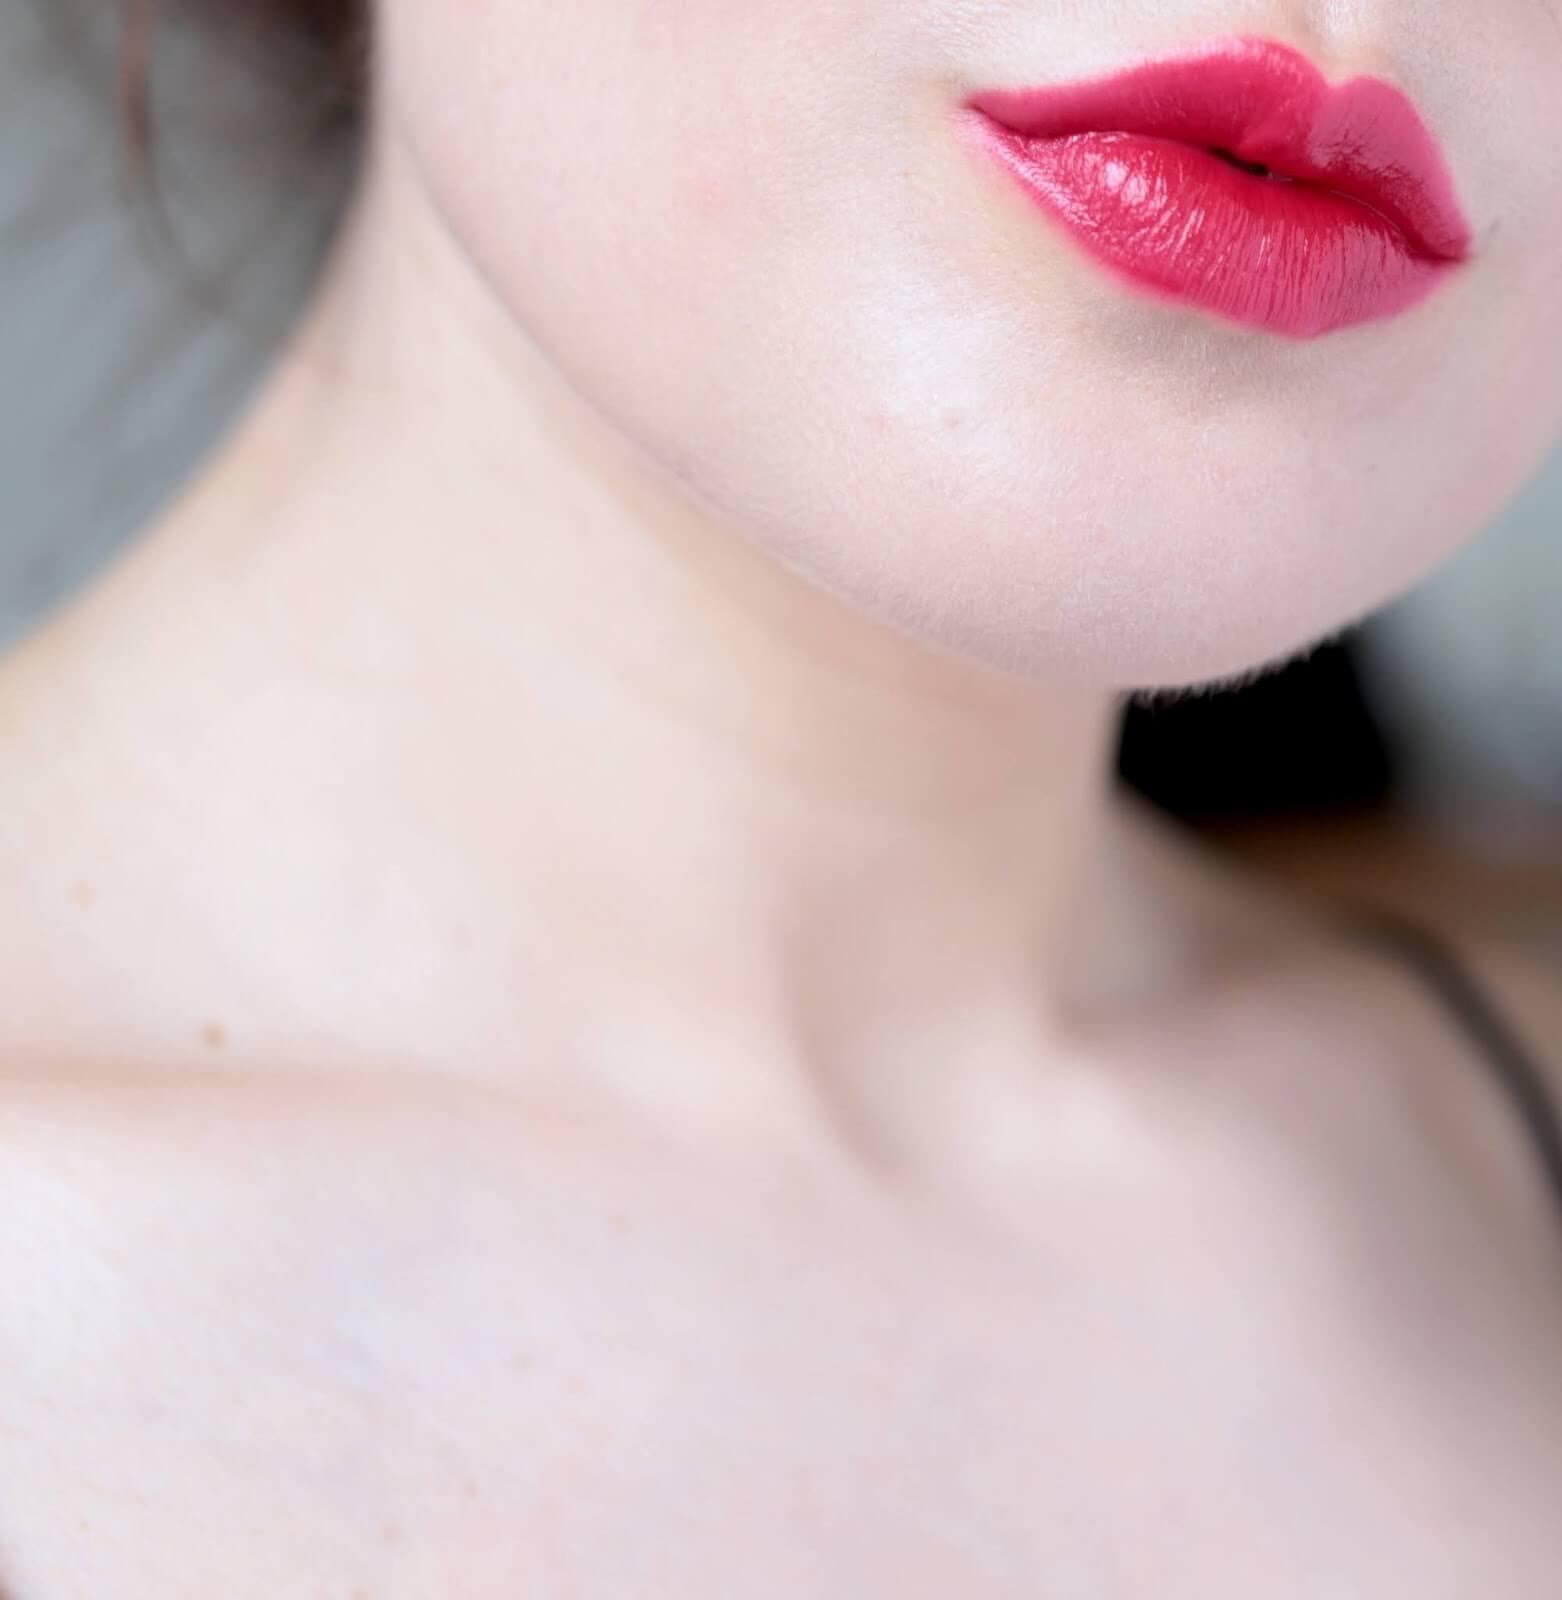 YSL Tatouage Couture Velvet Cream 203 Rose Dissident avis